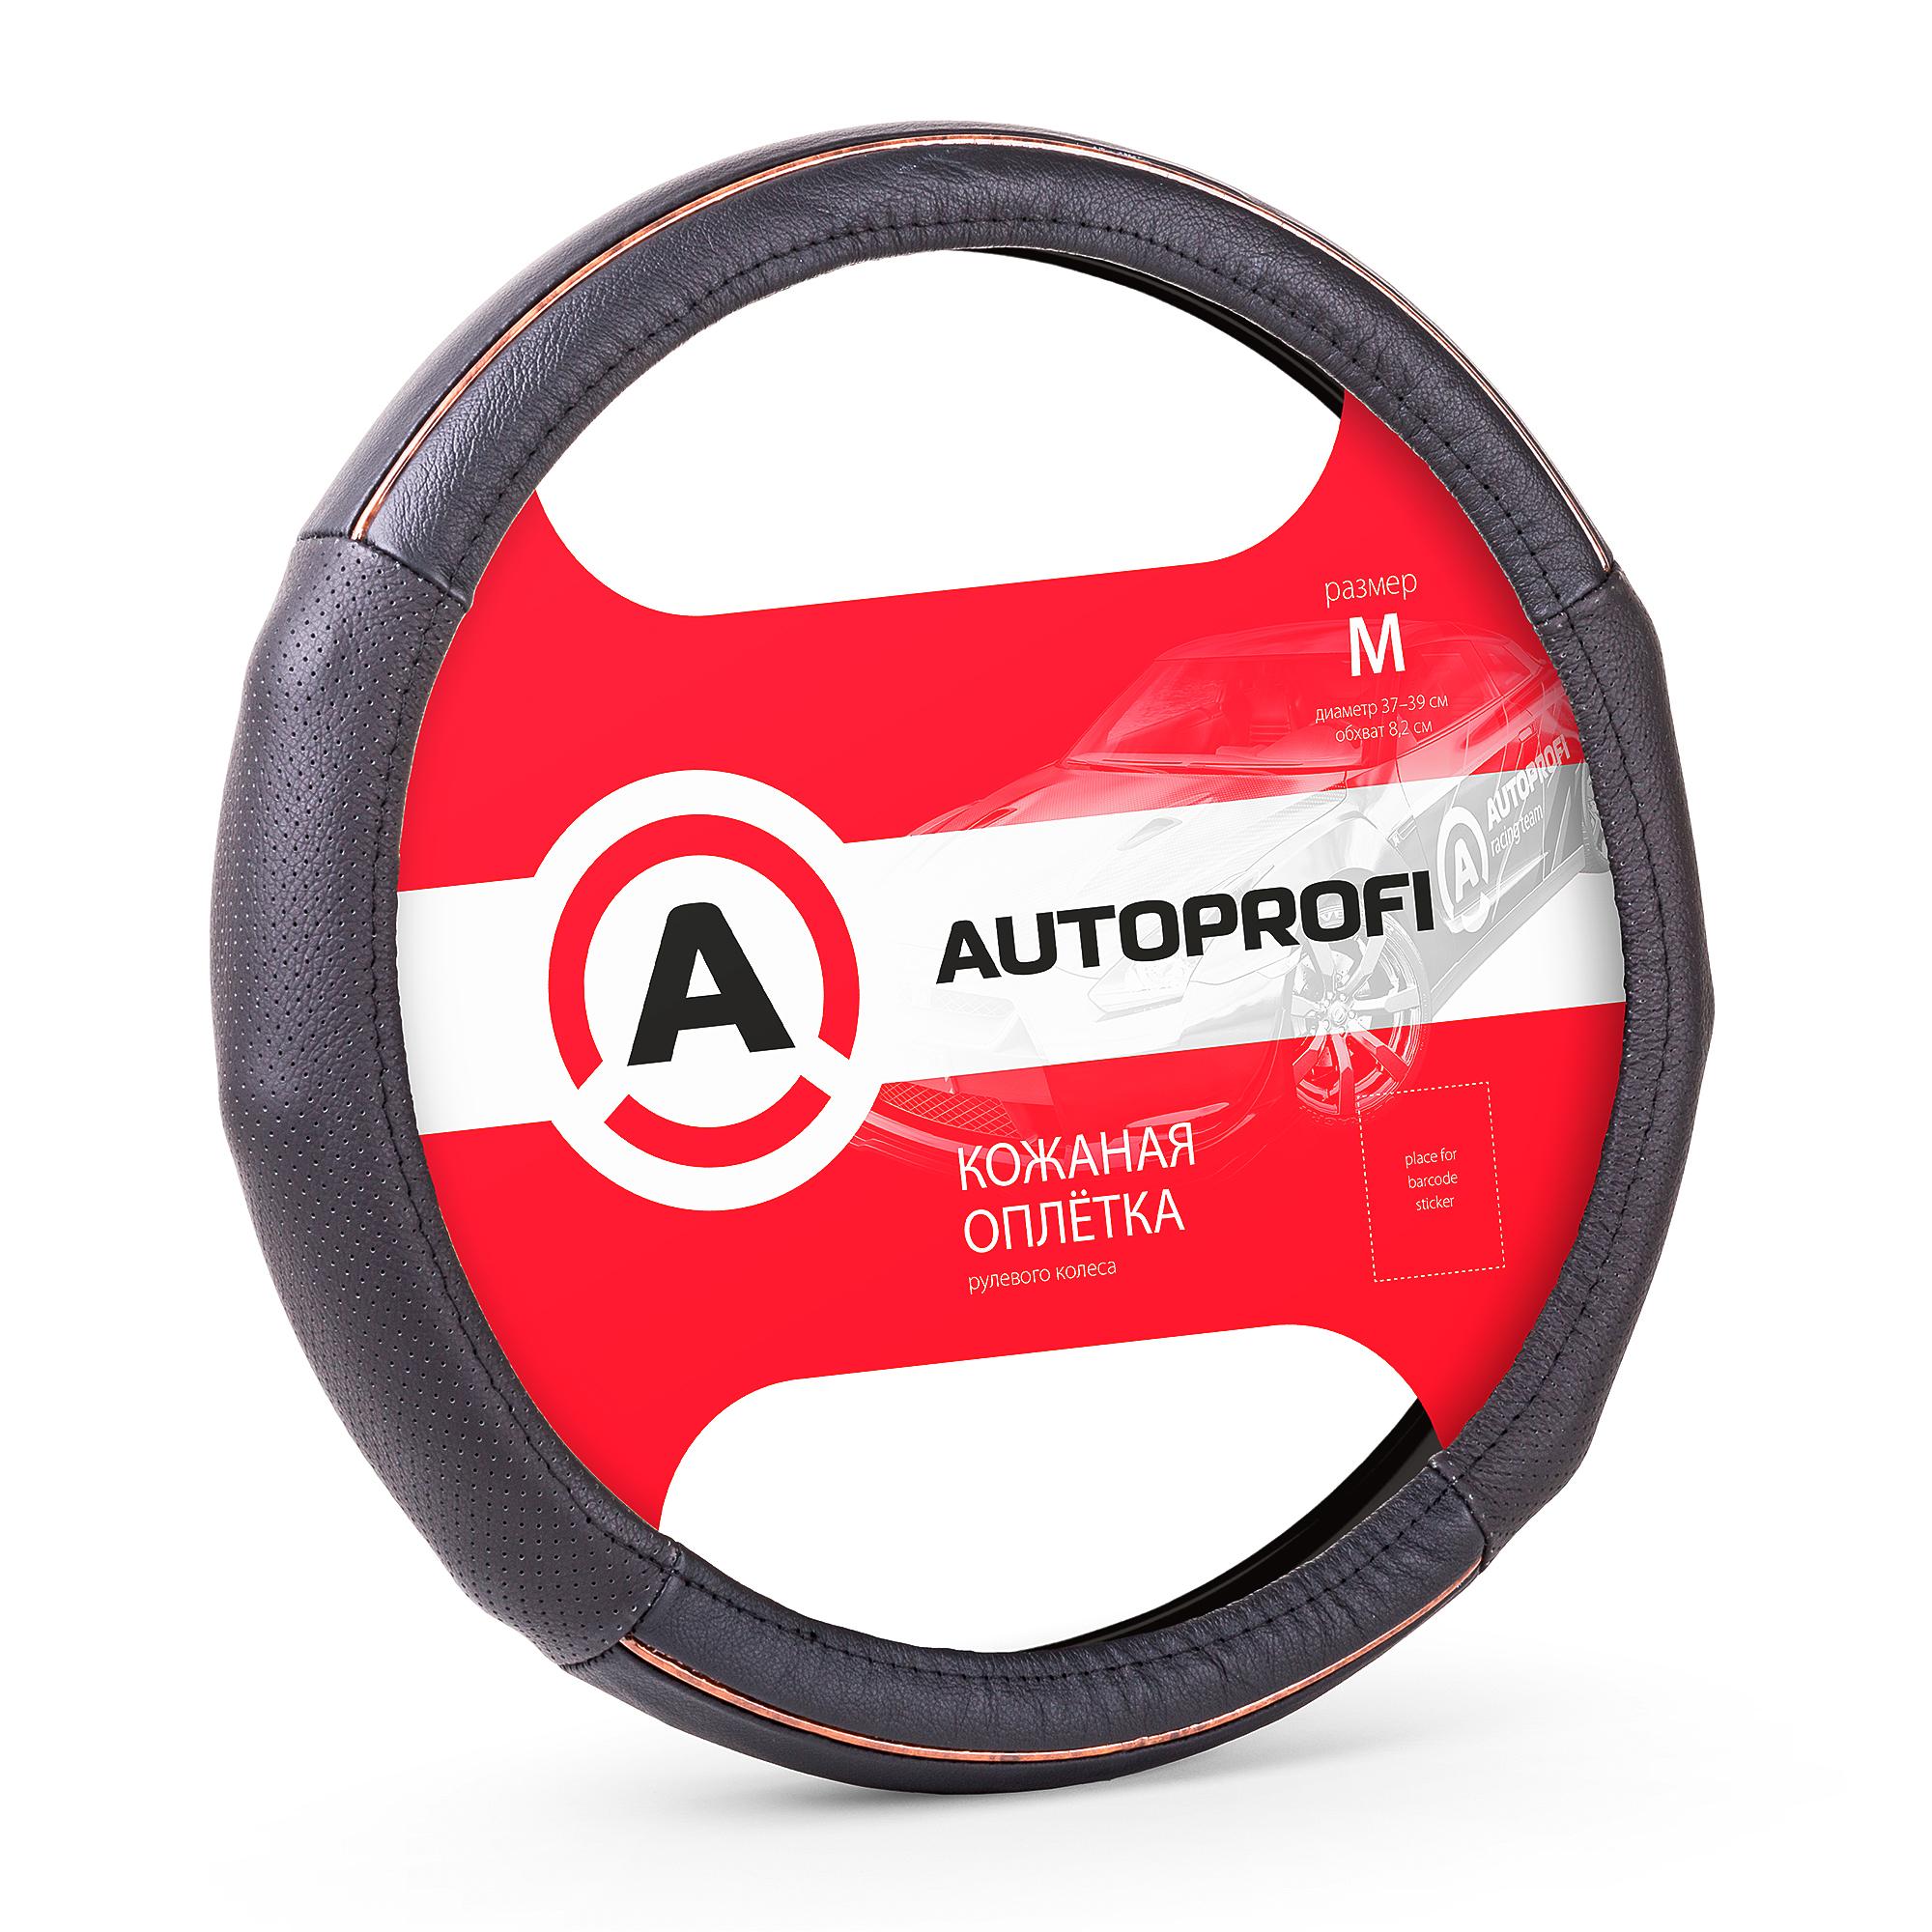 Оплетка Autoprofi Ap-1060 bk/bk (m) монитор benq 24 gl2450hm bk bk 9h l7cla rbe